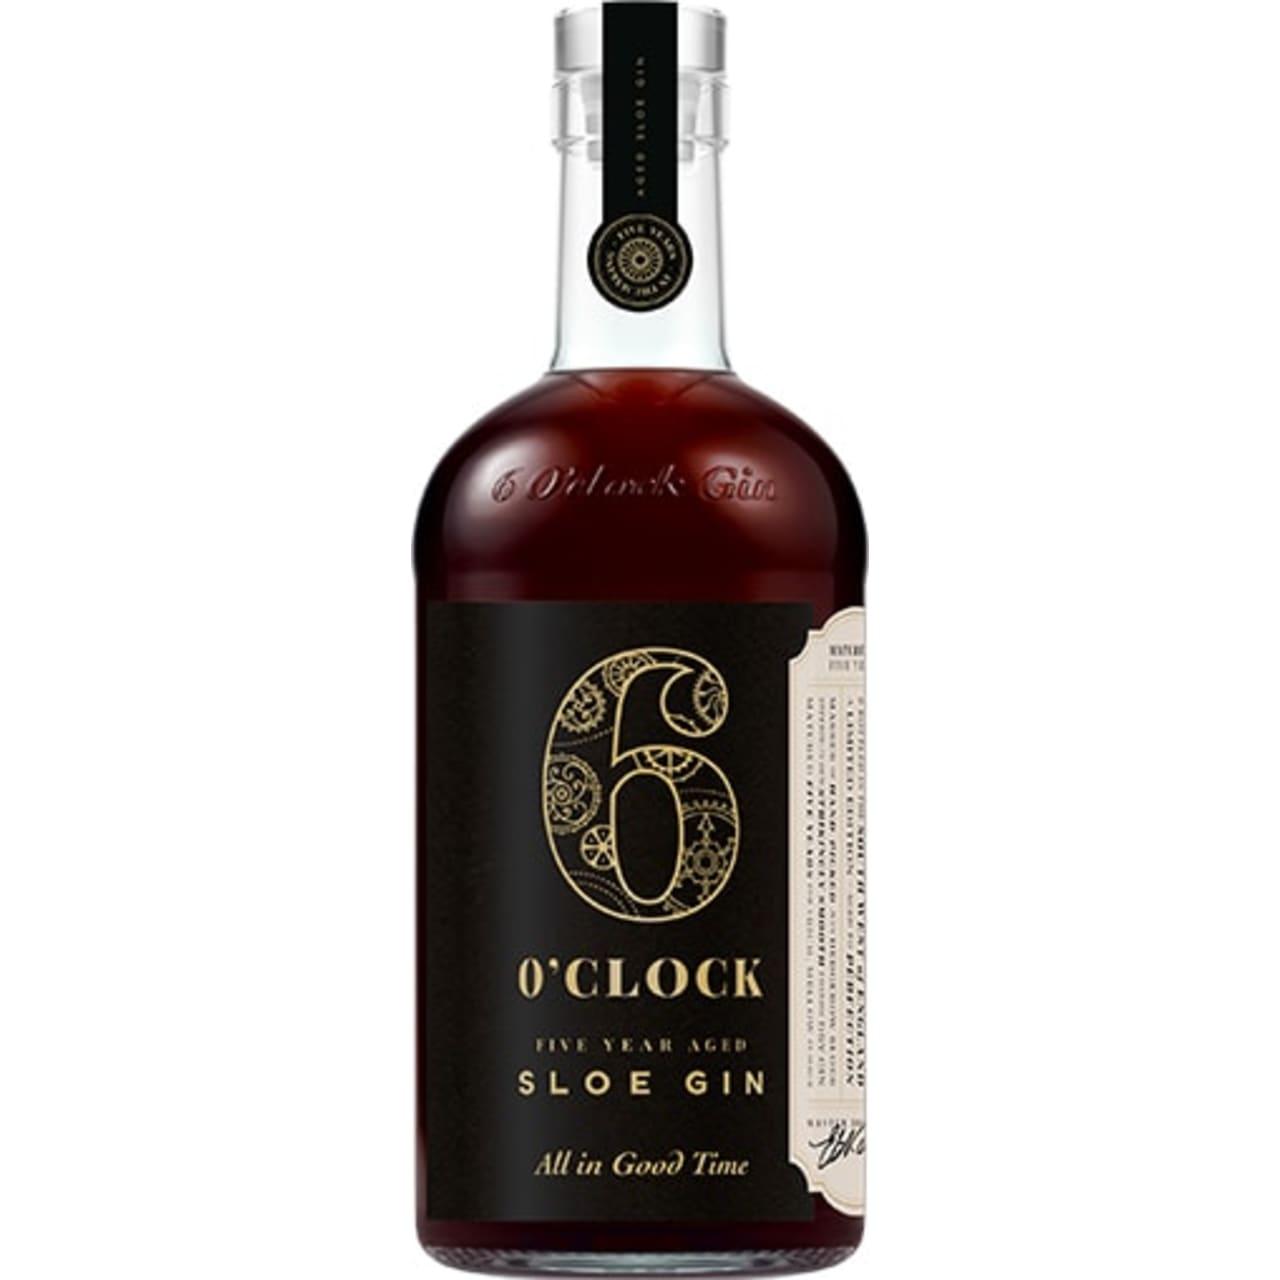 Product Image - 6 O'Clock 5 Year Old Sloe Gin